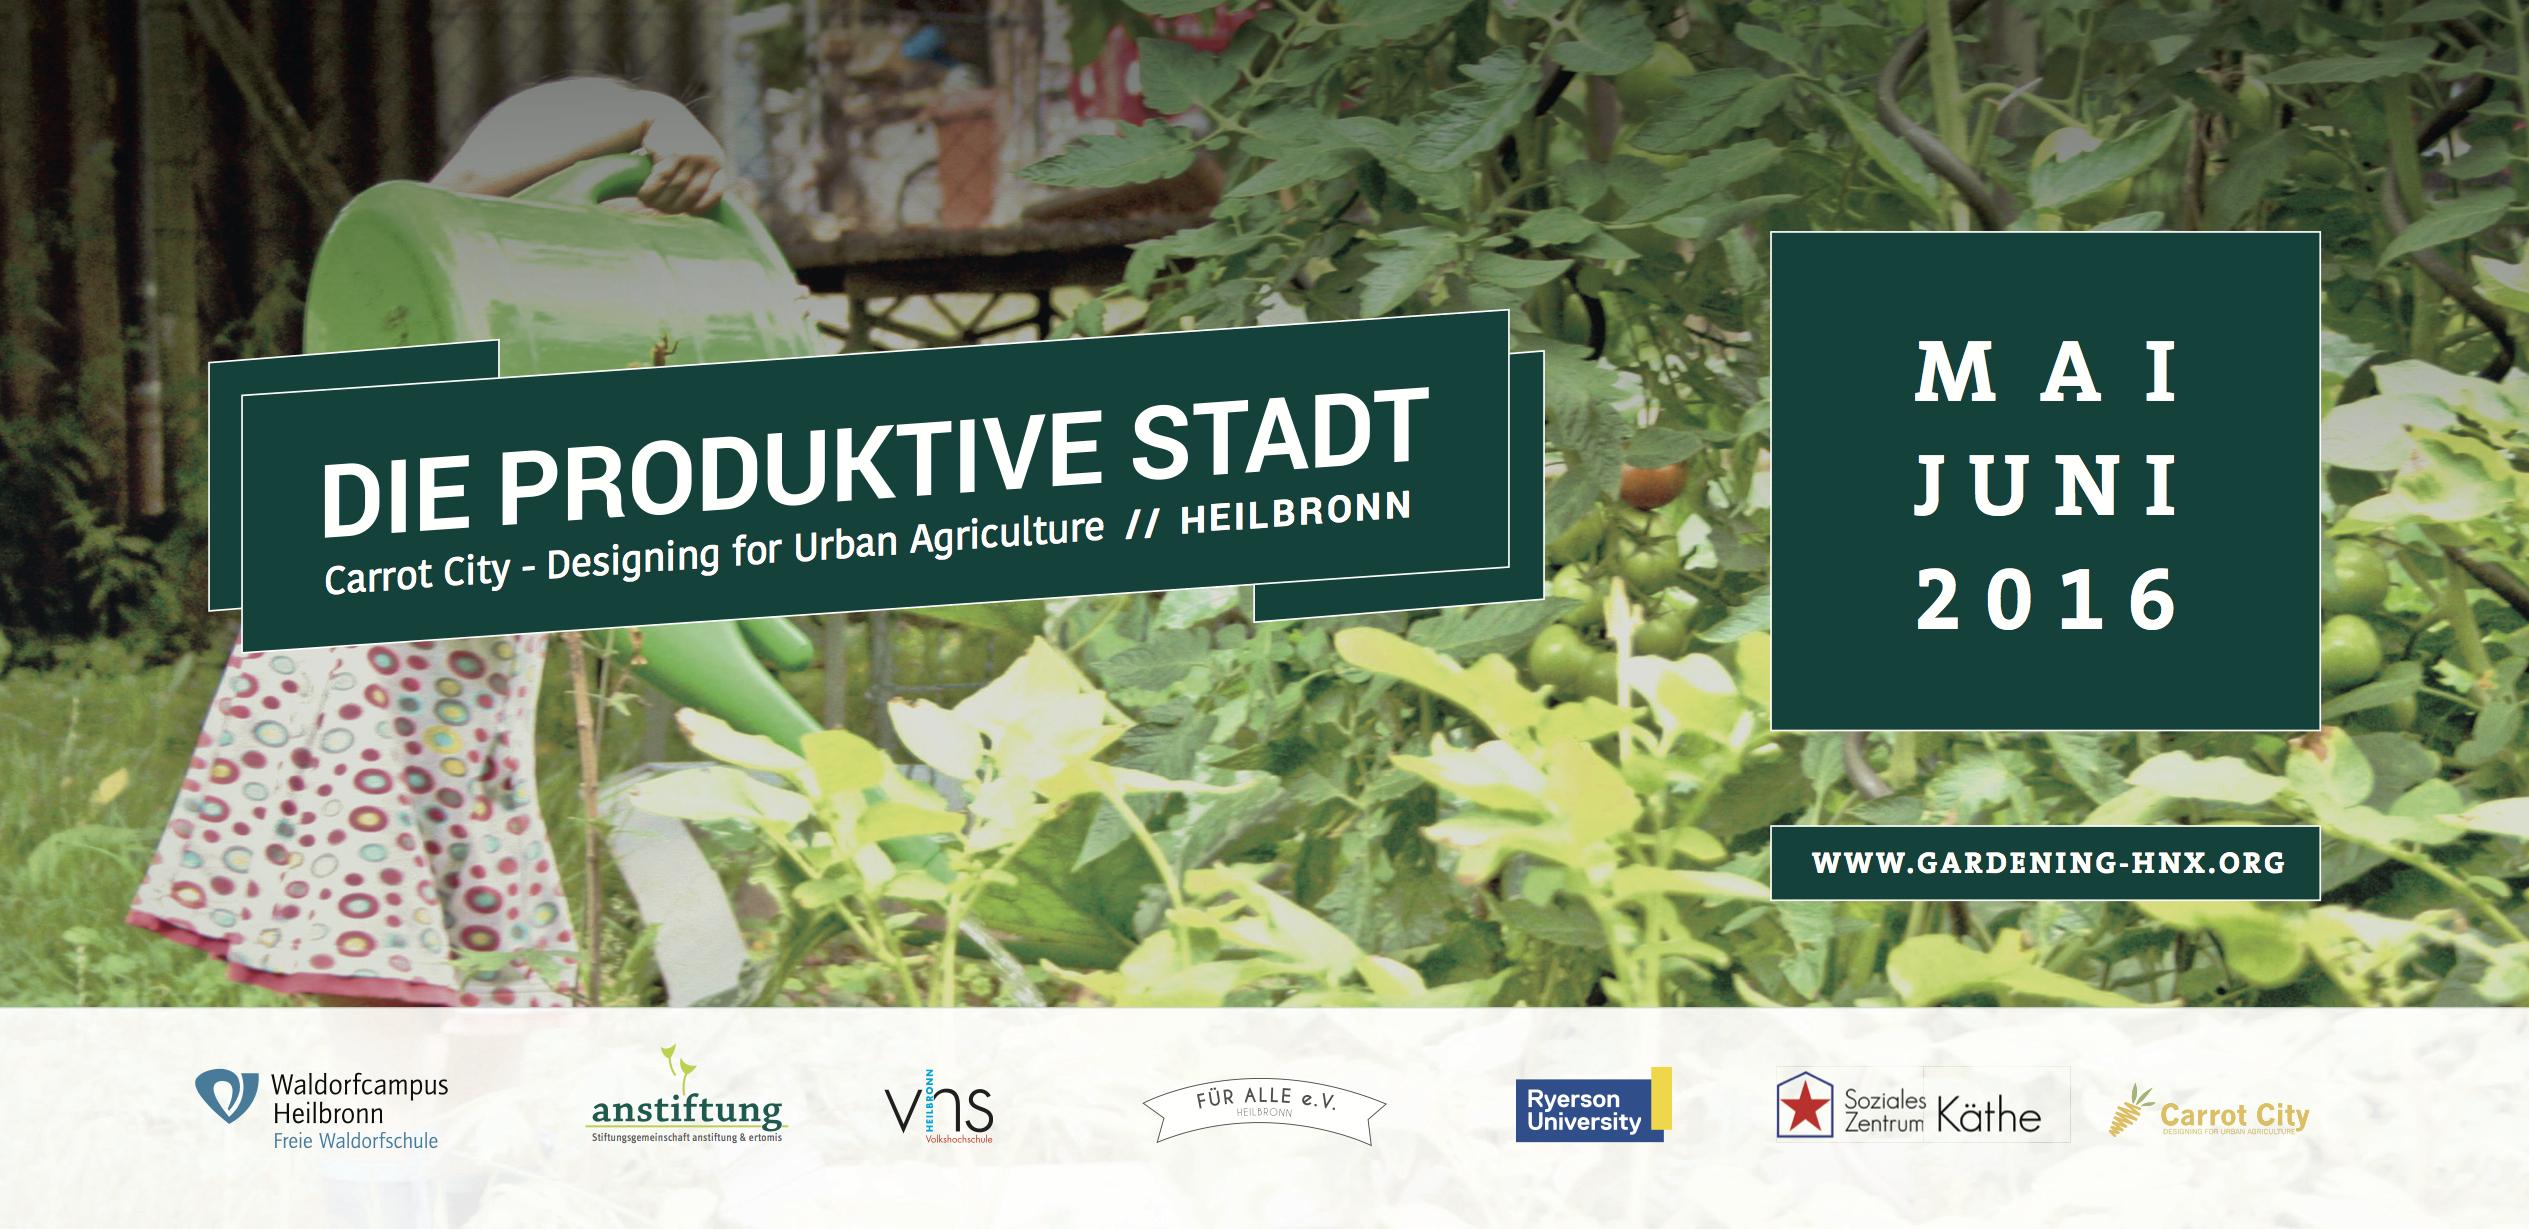 Die-produktive-Stadt_DIN-lang